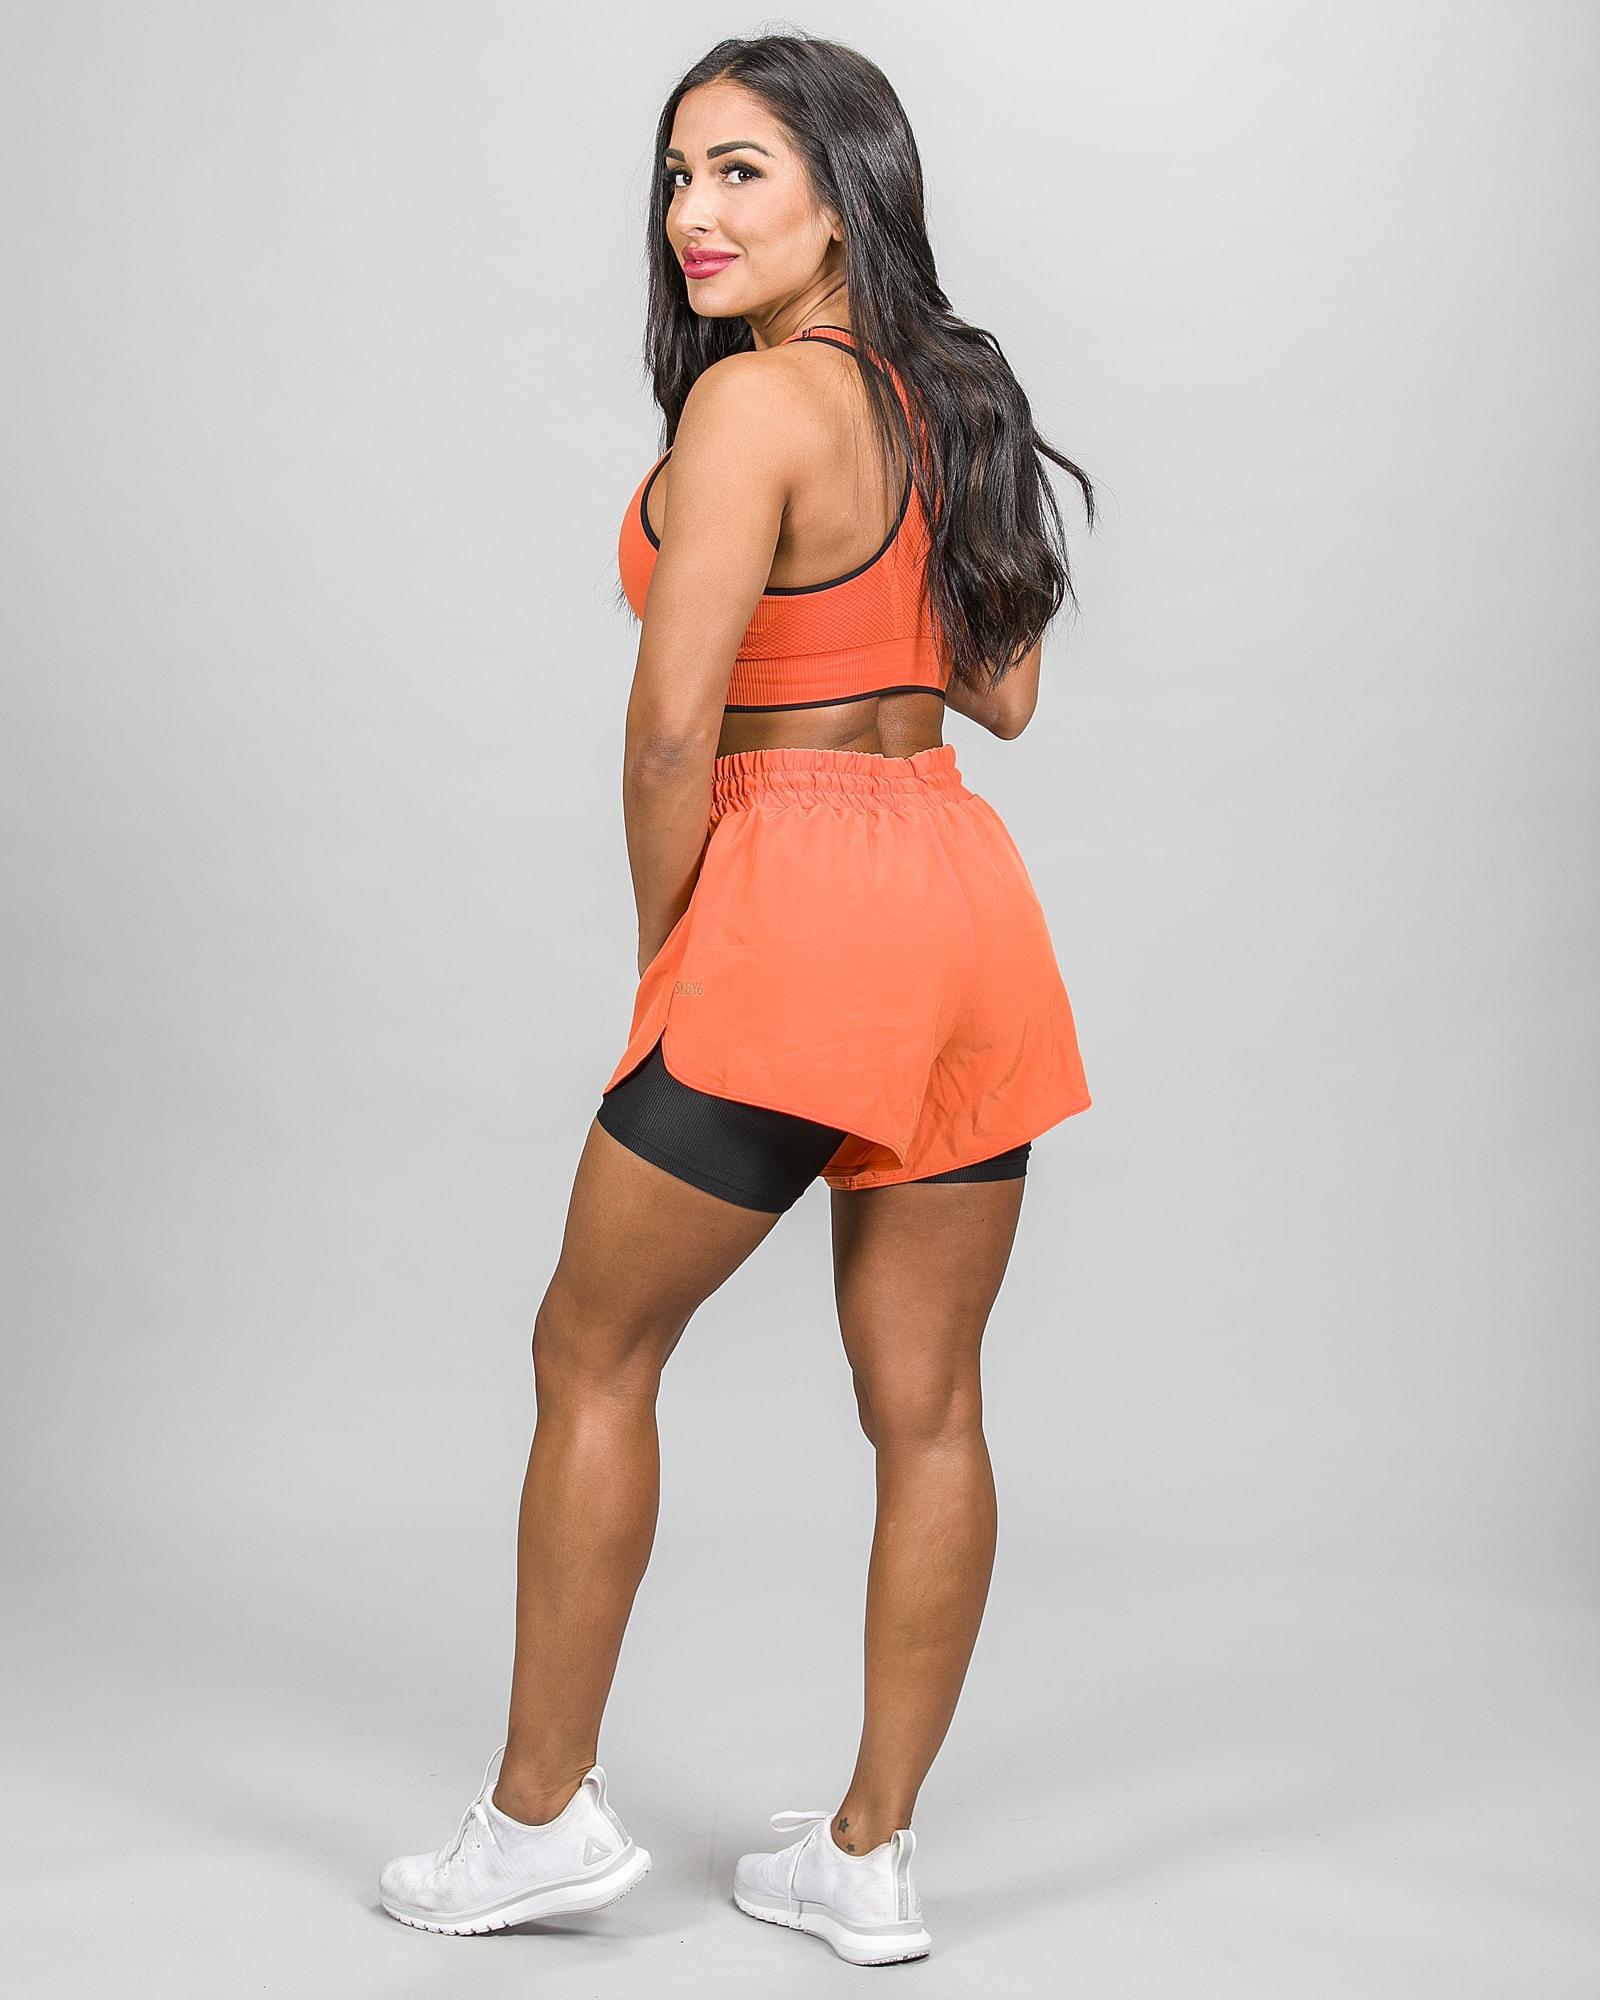 Skiny SK86 Shorts 083111and Crop Top 083094- Blazing Orange c